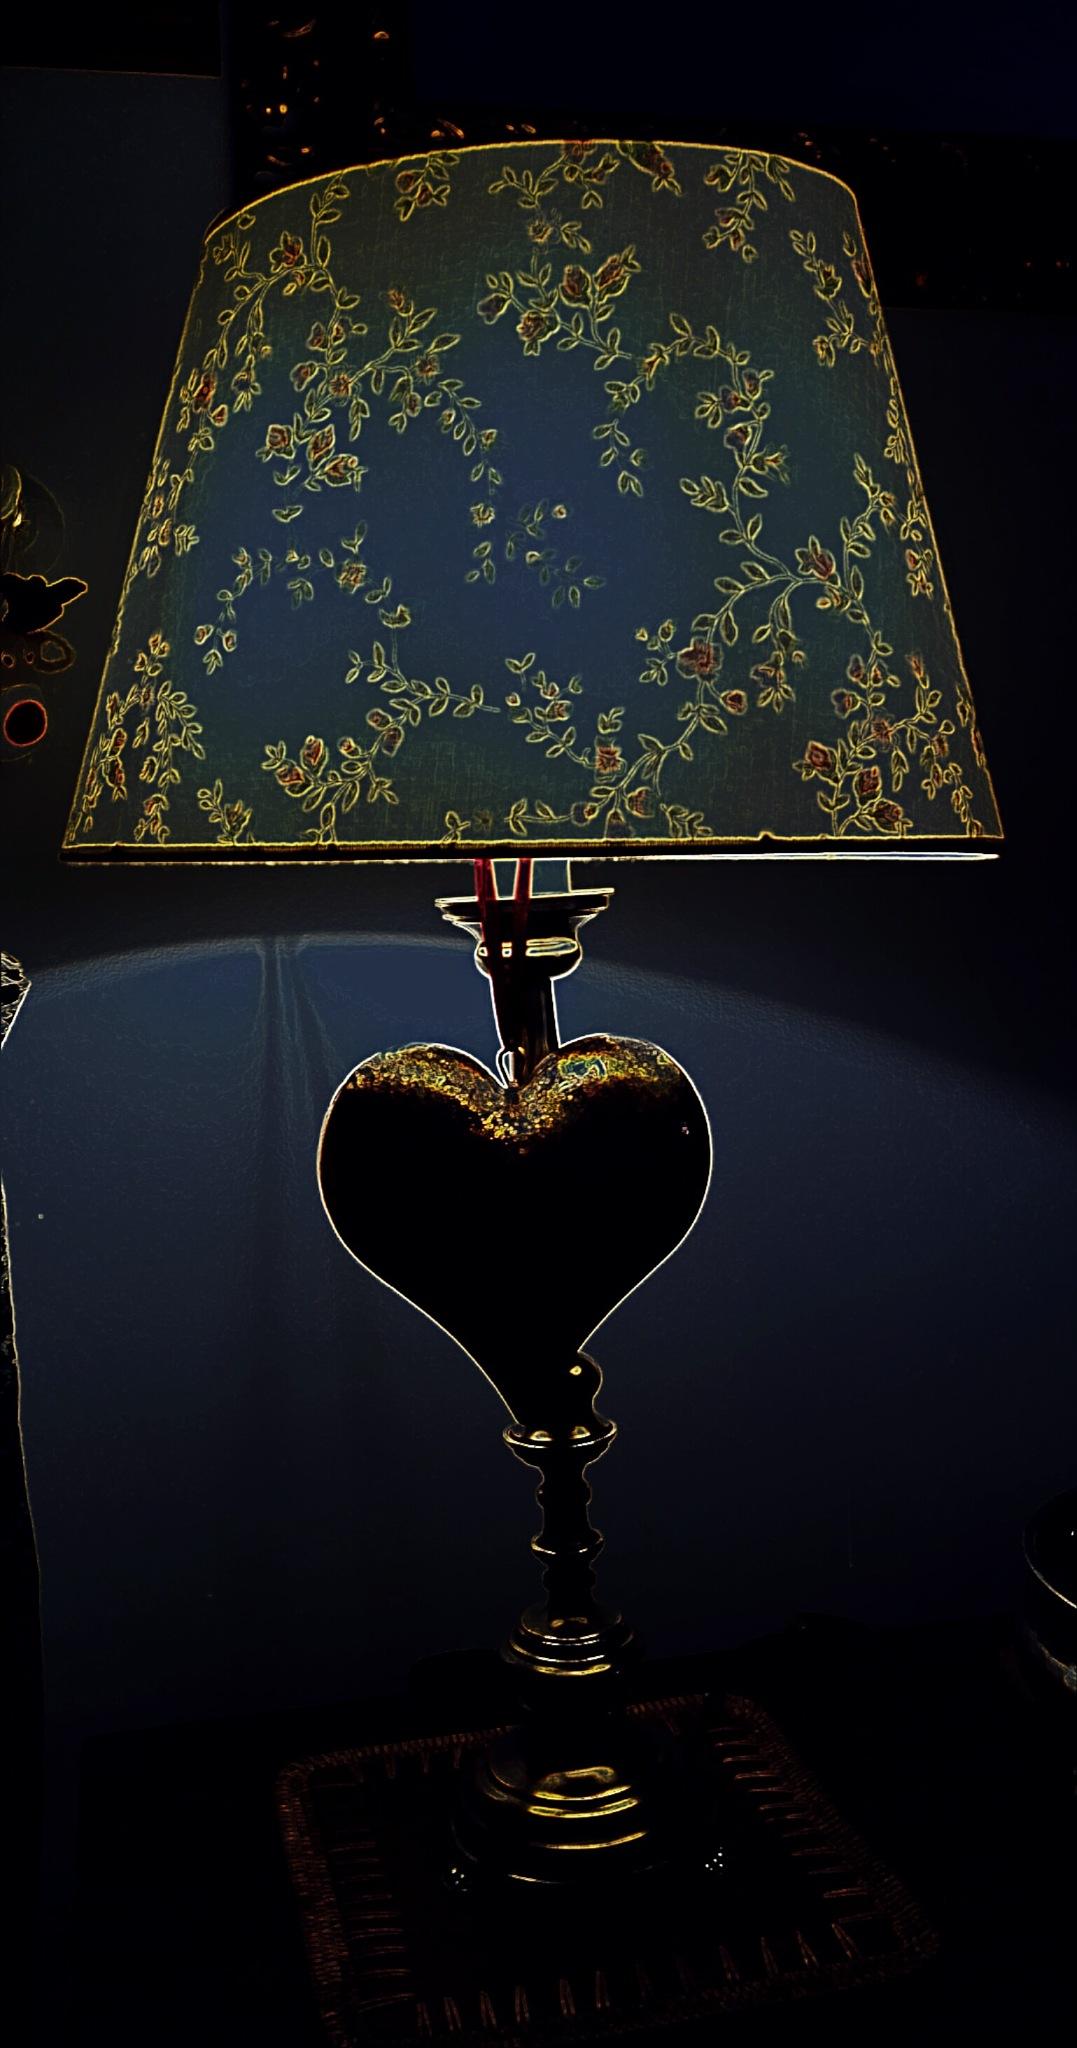 Heart's light by sandra.cimino.1